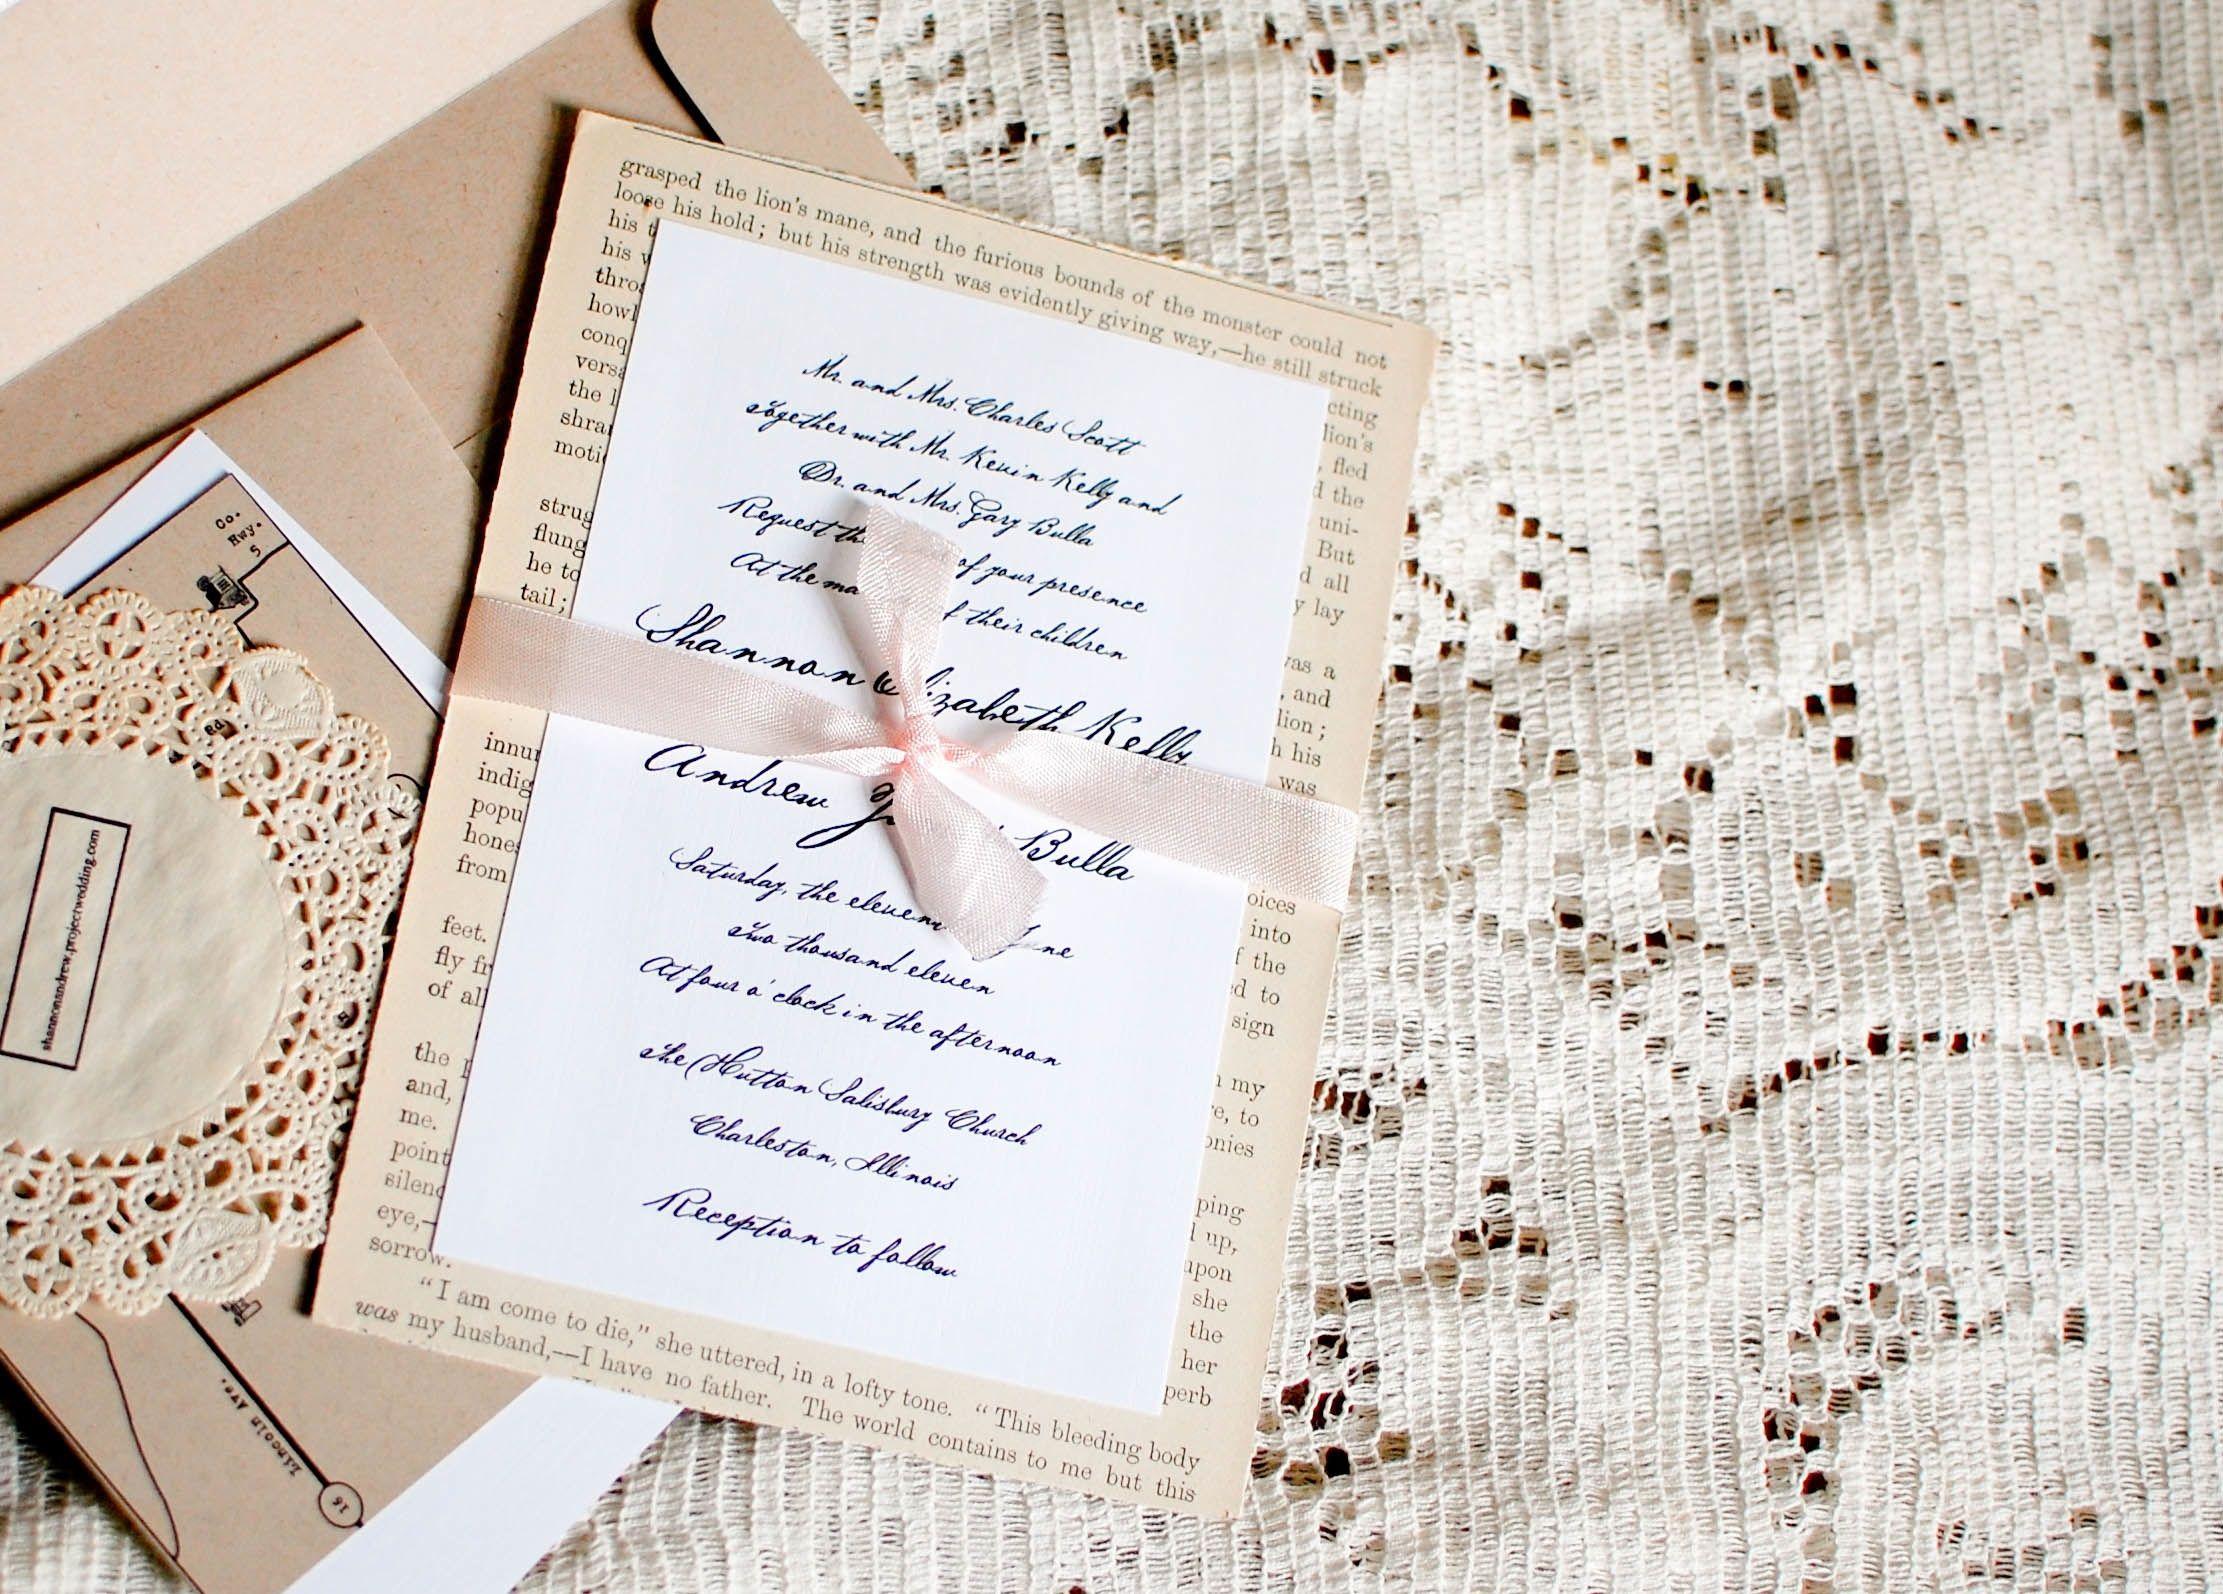 cheap wedding invitation kits | Low-Cost Wedding Ideas | Pinterest ...